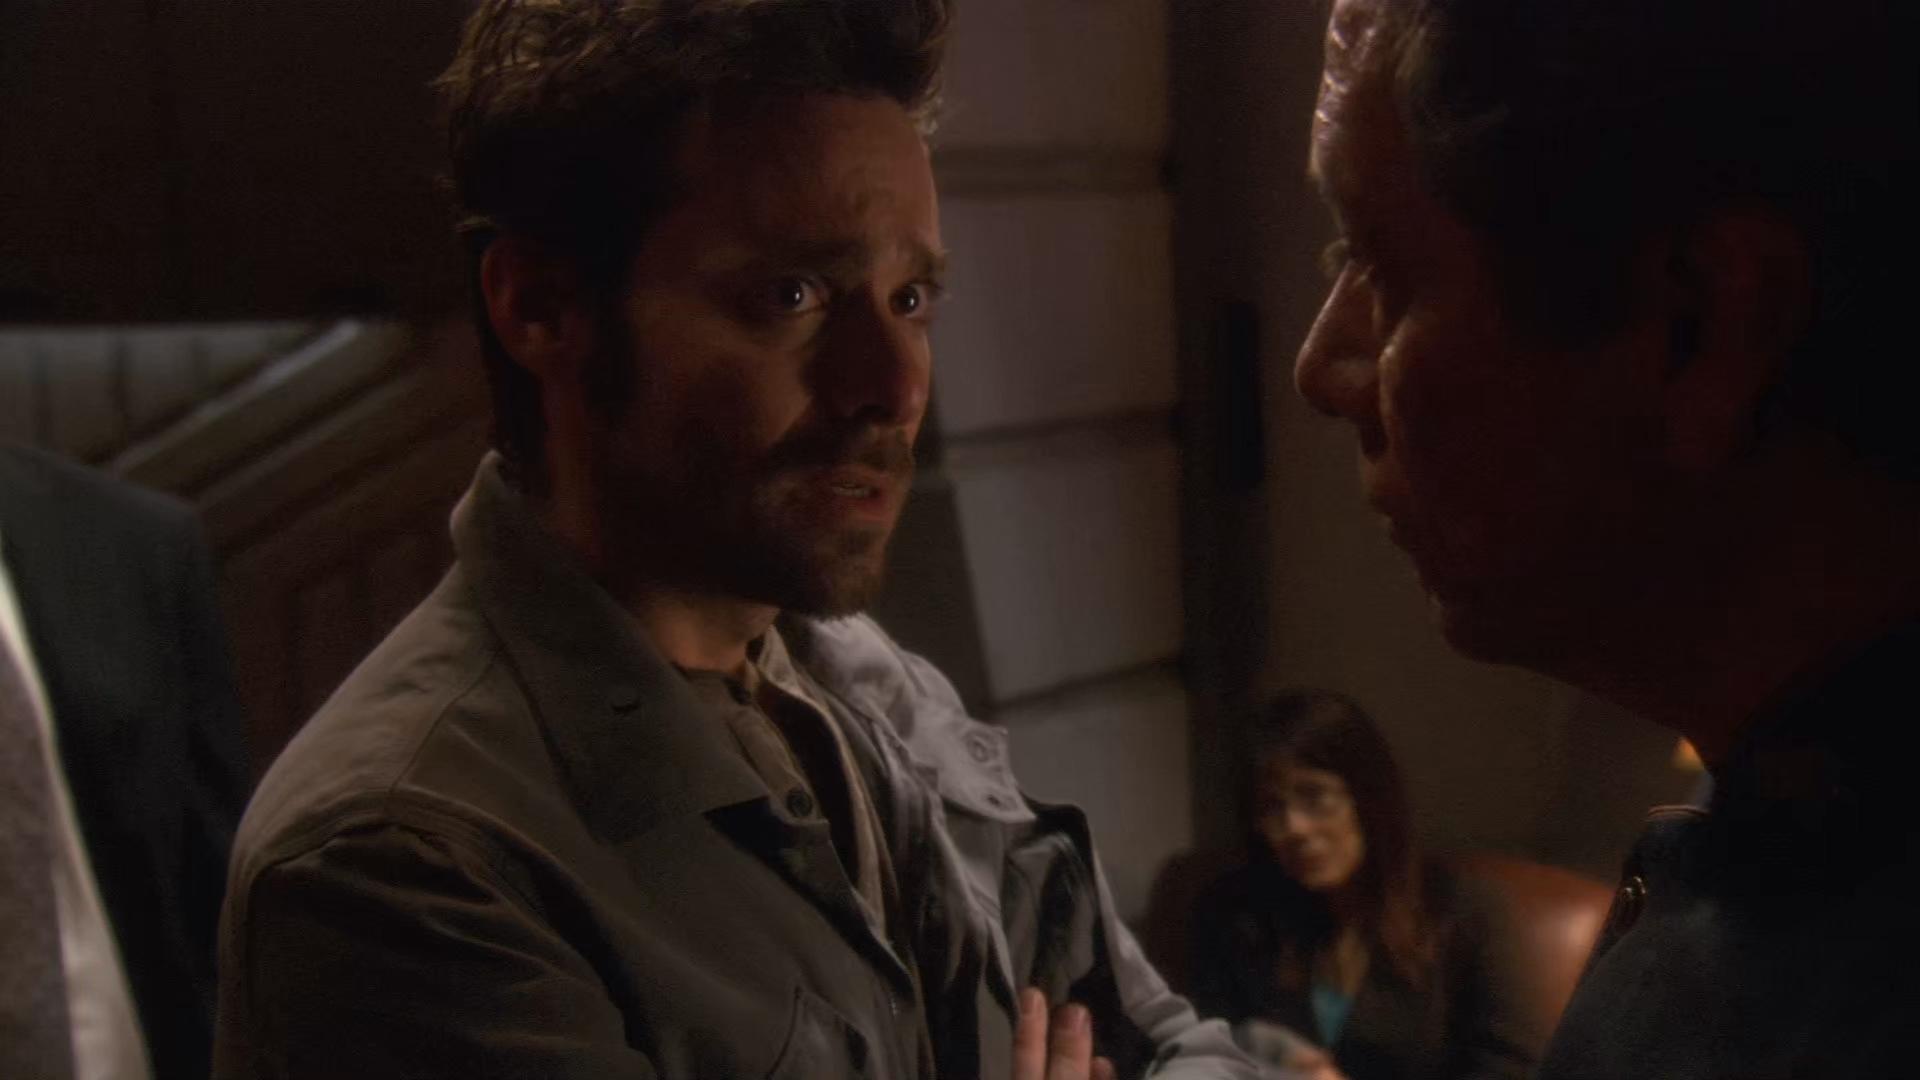 Battlestar.Galactica.2007.S04E16.Deadlock.BluRay.1080p.Dts.HEVC-d3g.mkv_snapshot_39.53.000.jpg